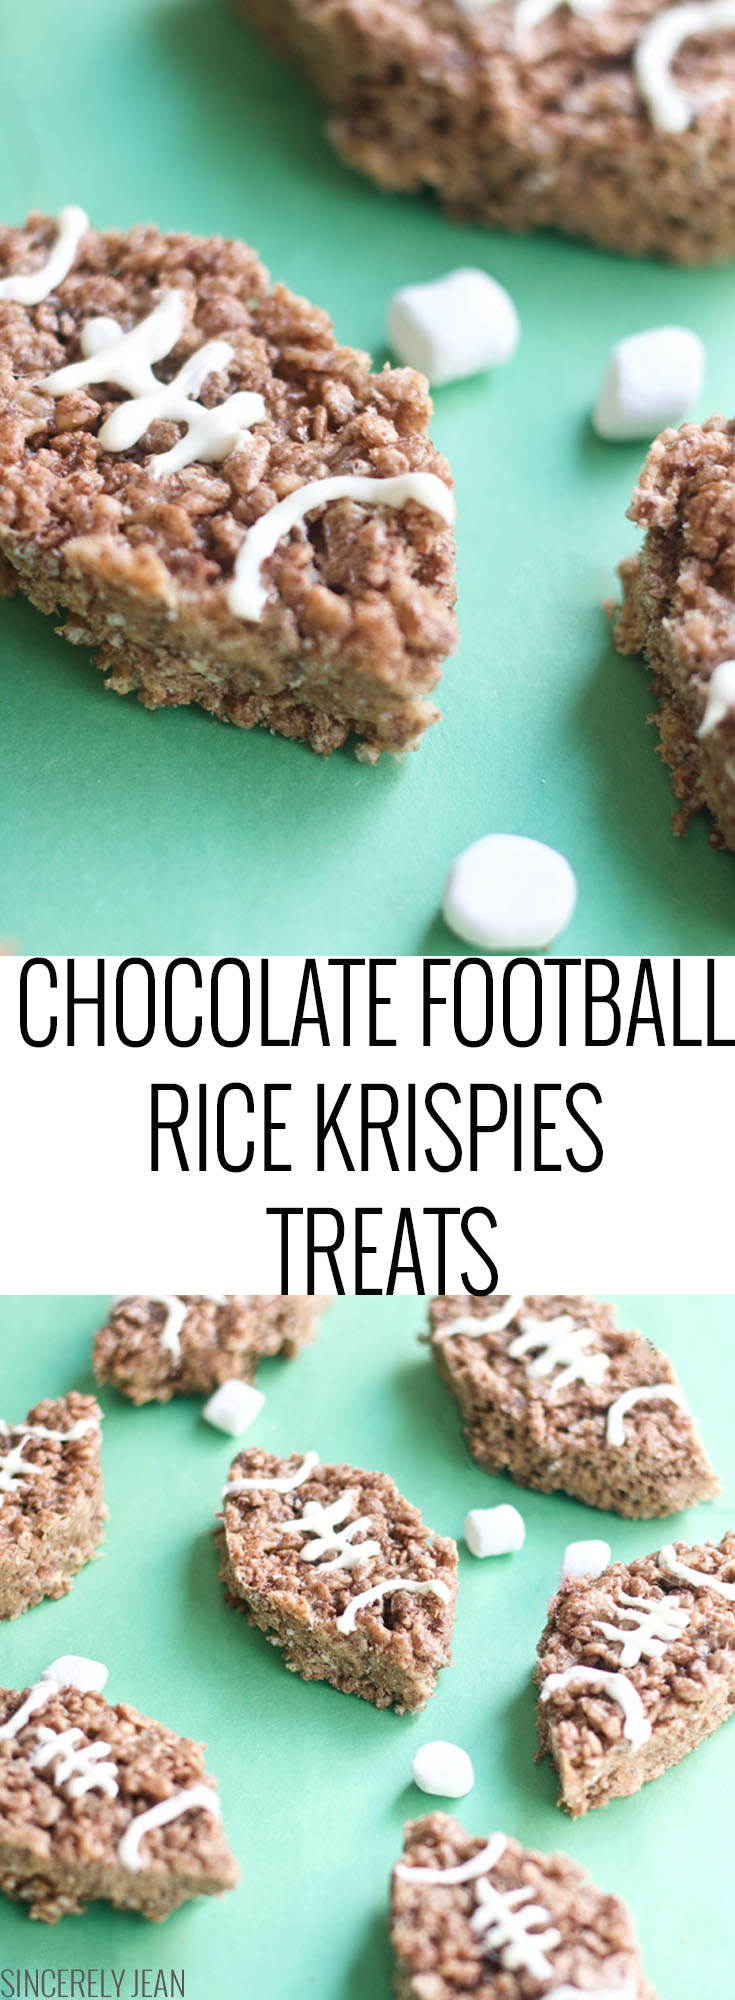 Chocolate Football Rice Krispies Treats, Rice Krispies Treats, Super Bowl, dessert, football, chocolate, game, marshmallows, diy, easy, simple